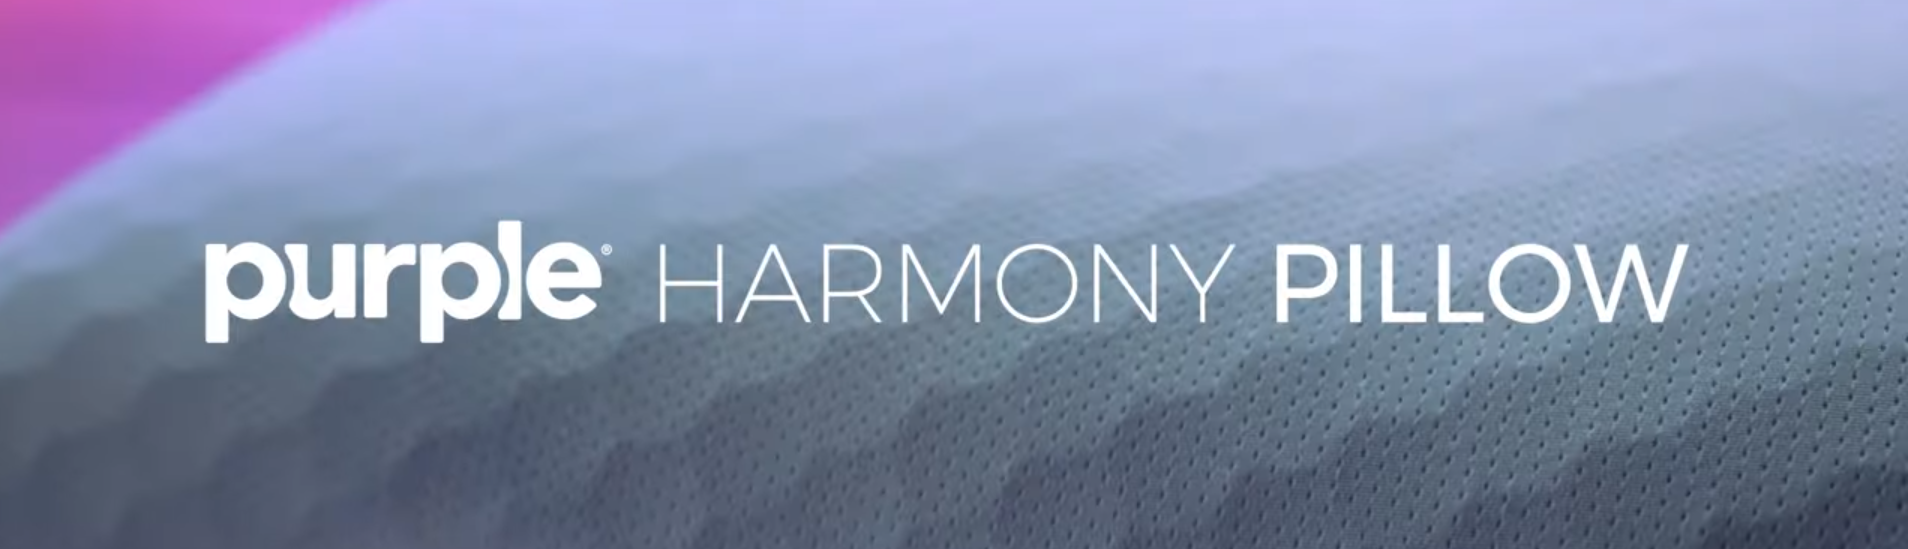 we tried the purple harmony pillow